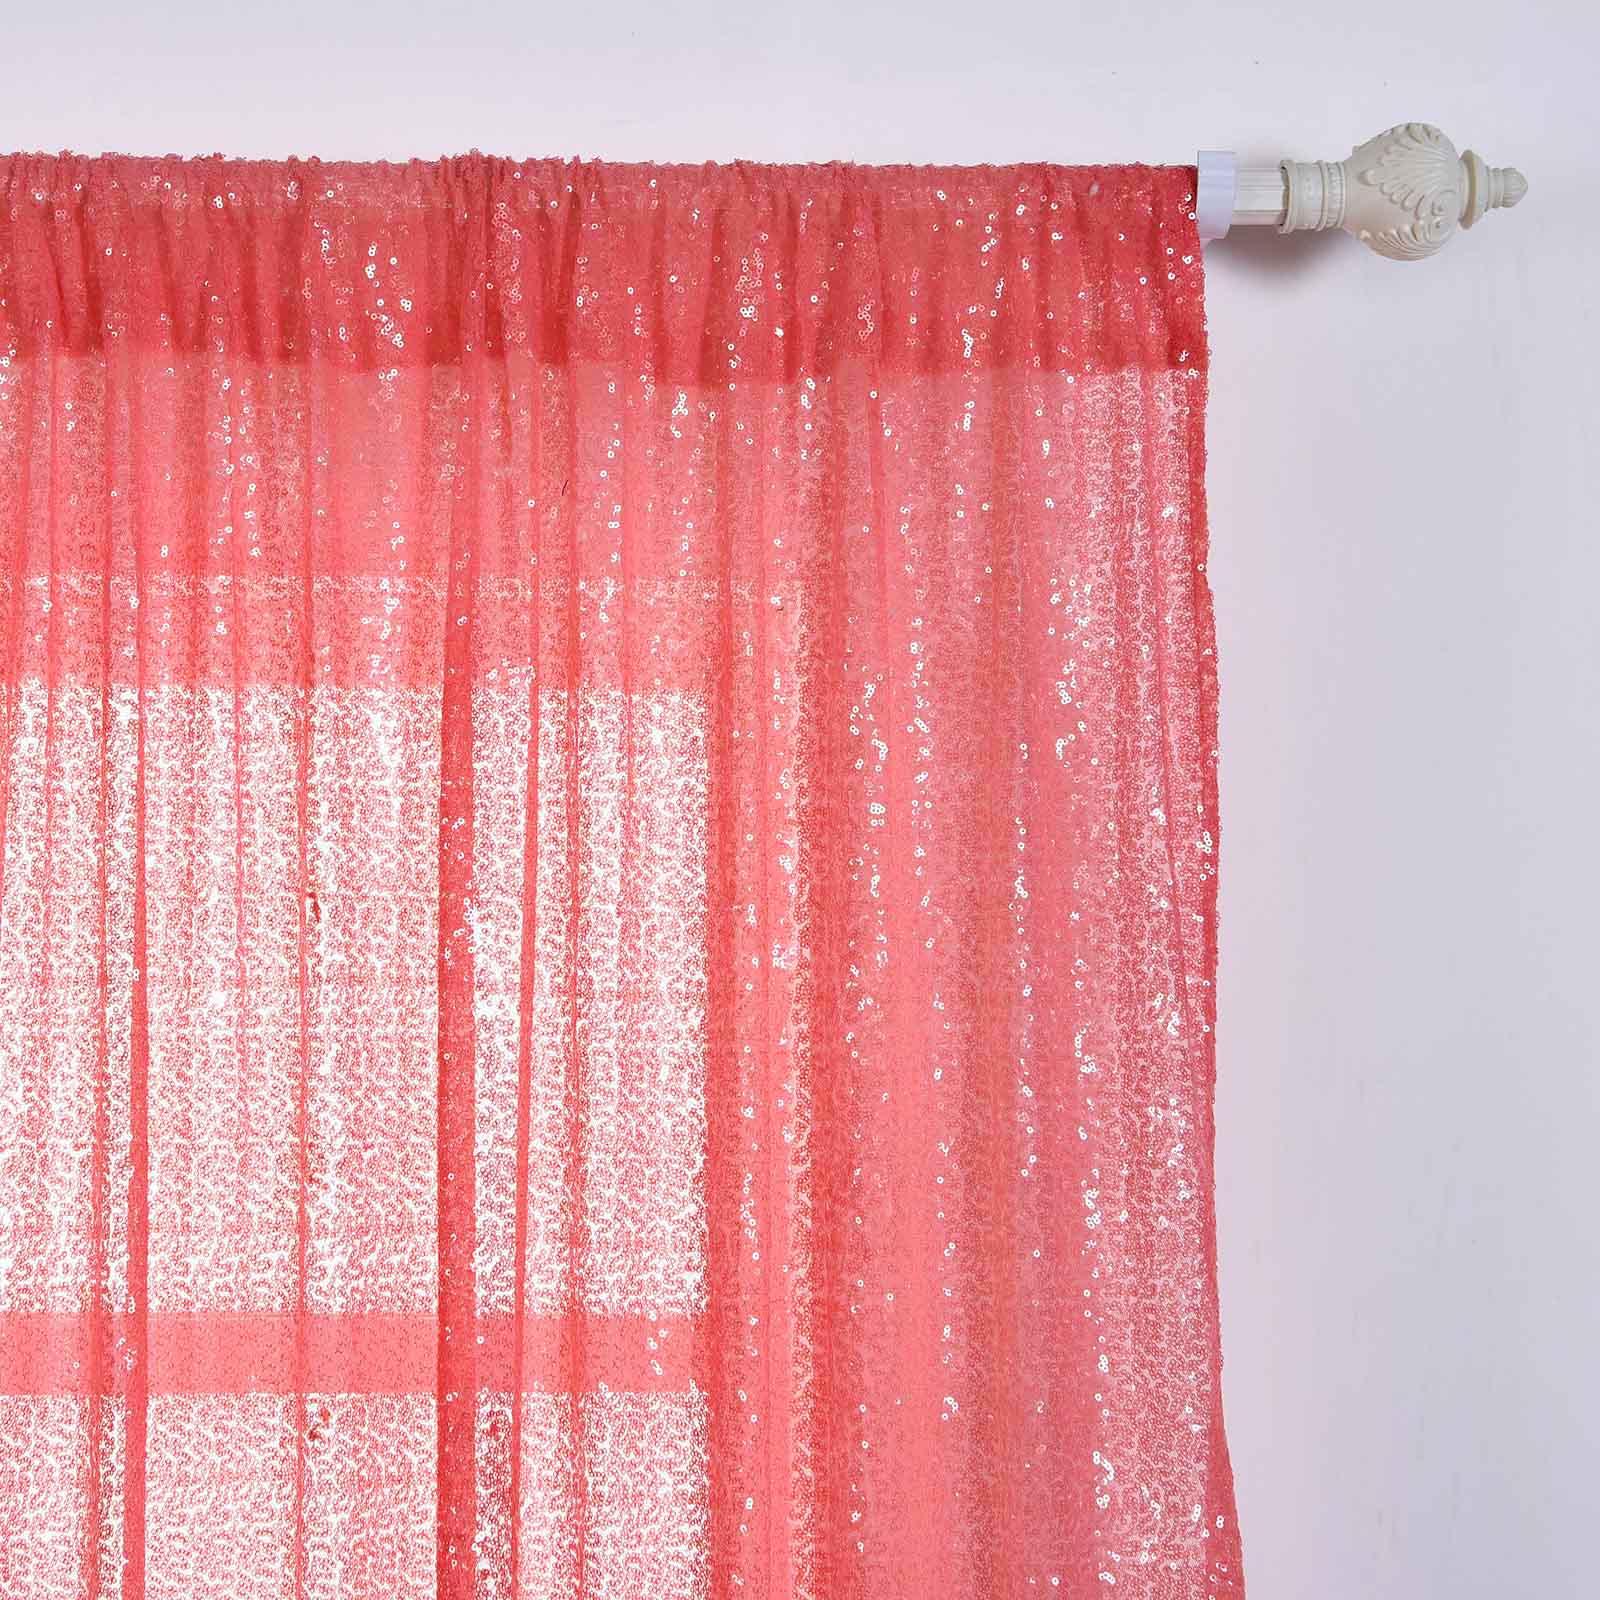 4-pcs-52-034-x-84-034-Sequined-Window-Curtains-Drapes-Panels-Backdrop-Home-Party-Decor thumbnail 21